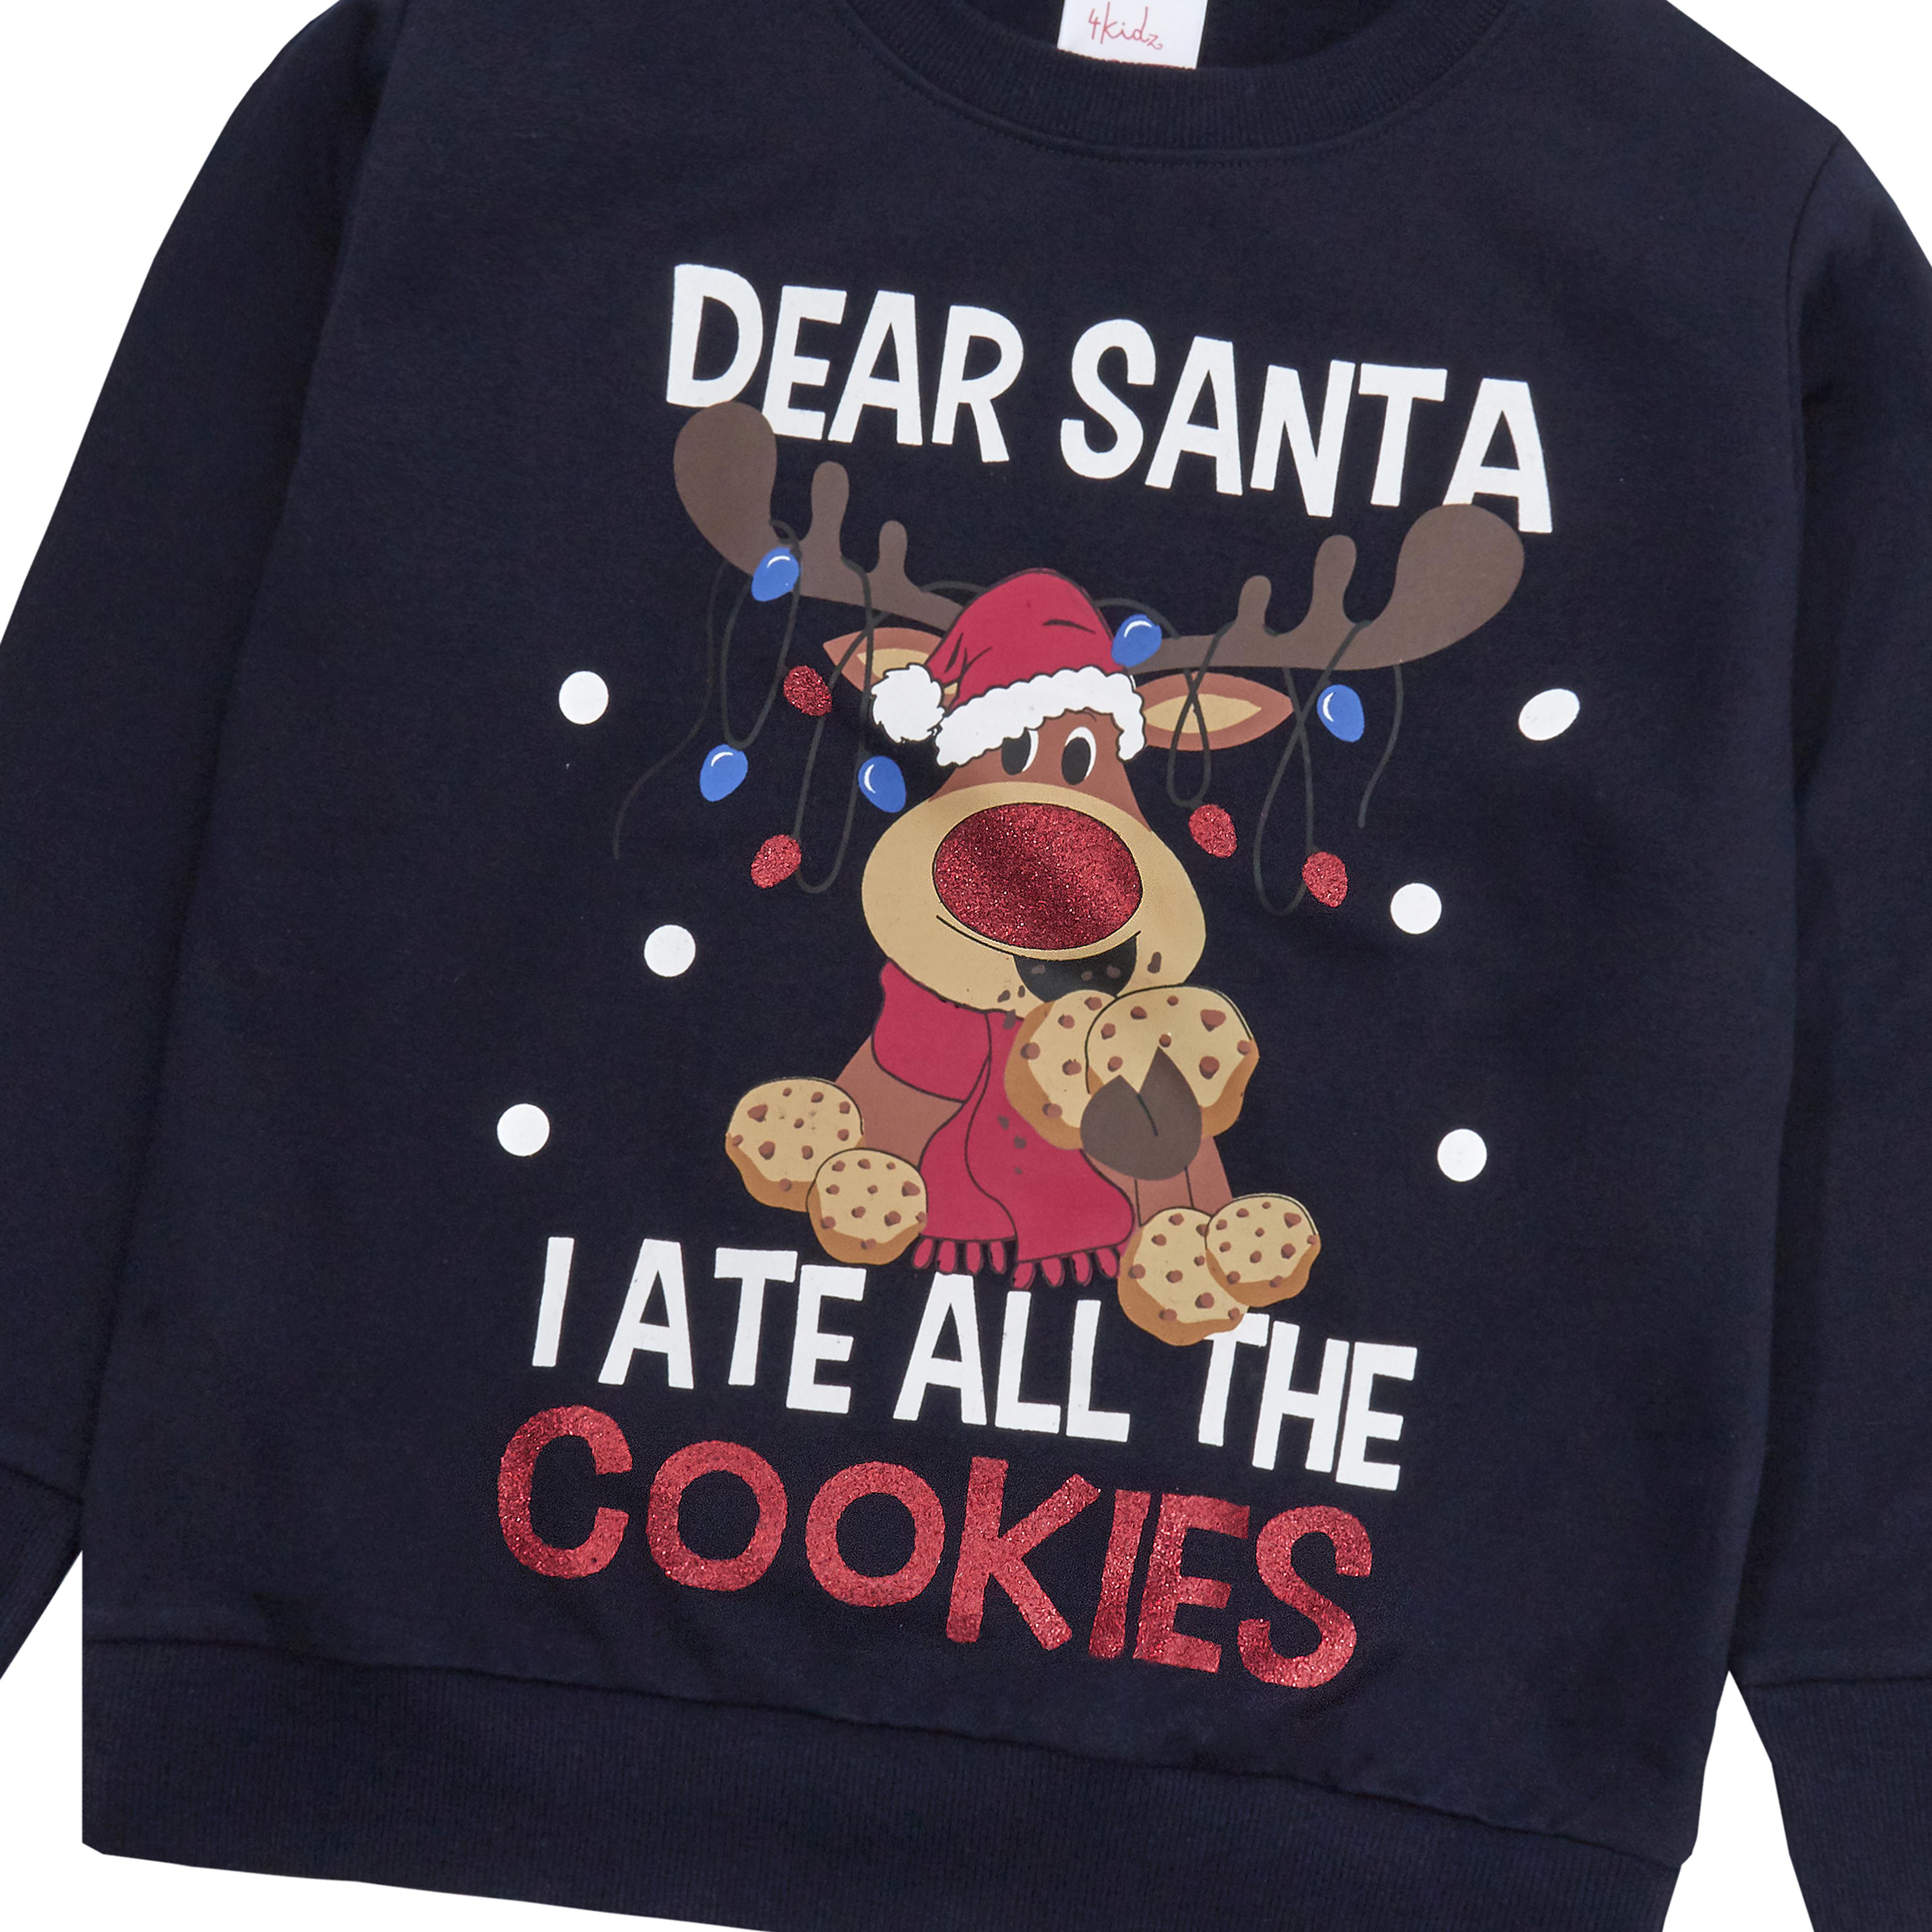 Enfants-Garcons-Filles-Noel-Noel-Pull-Sweat-shirt-Carlin-Glitter-chaud miniature 16